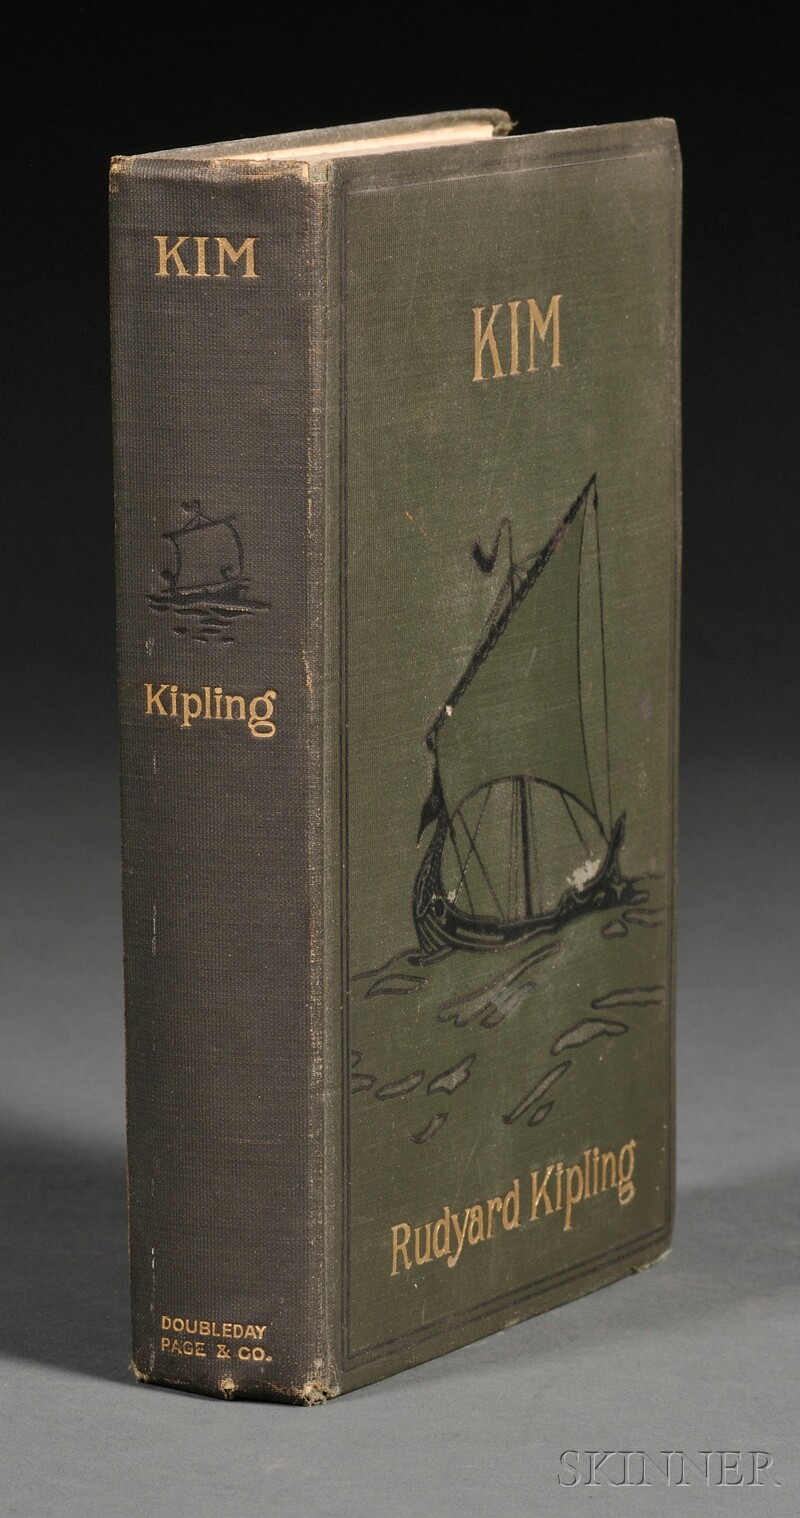 Kipling, Rudyard (1865-1936)   Kim